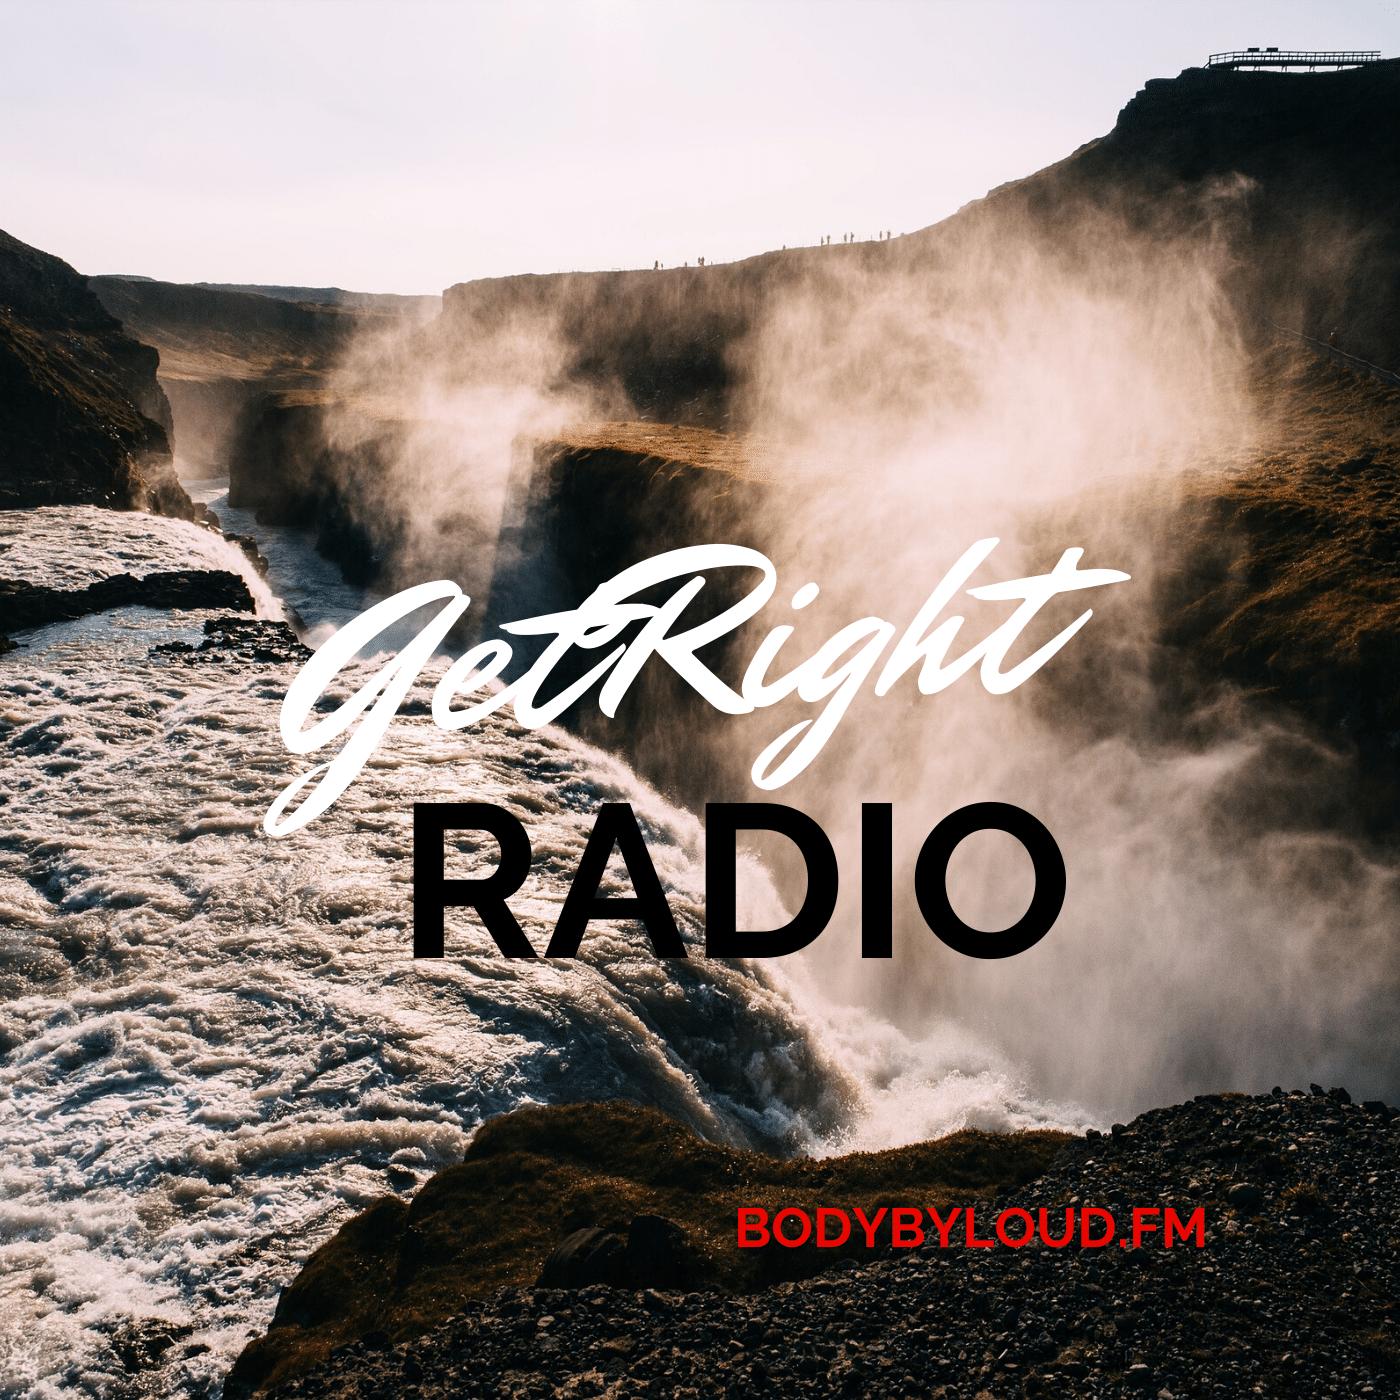 Bodybyloud.FM is GetRIght Radio